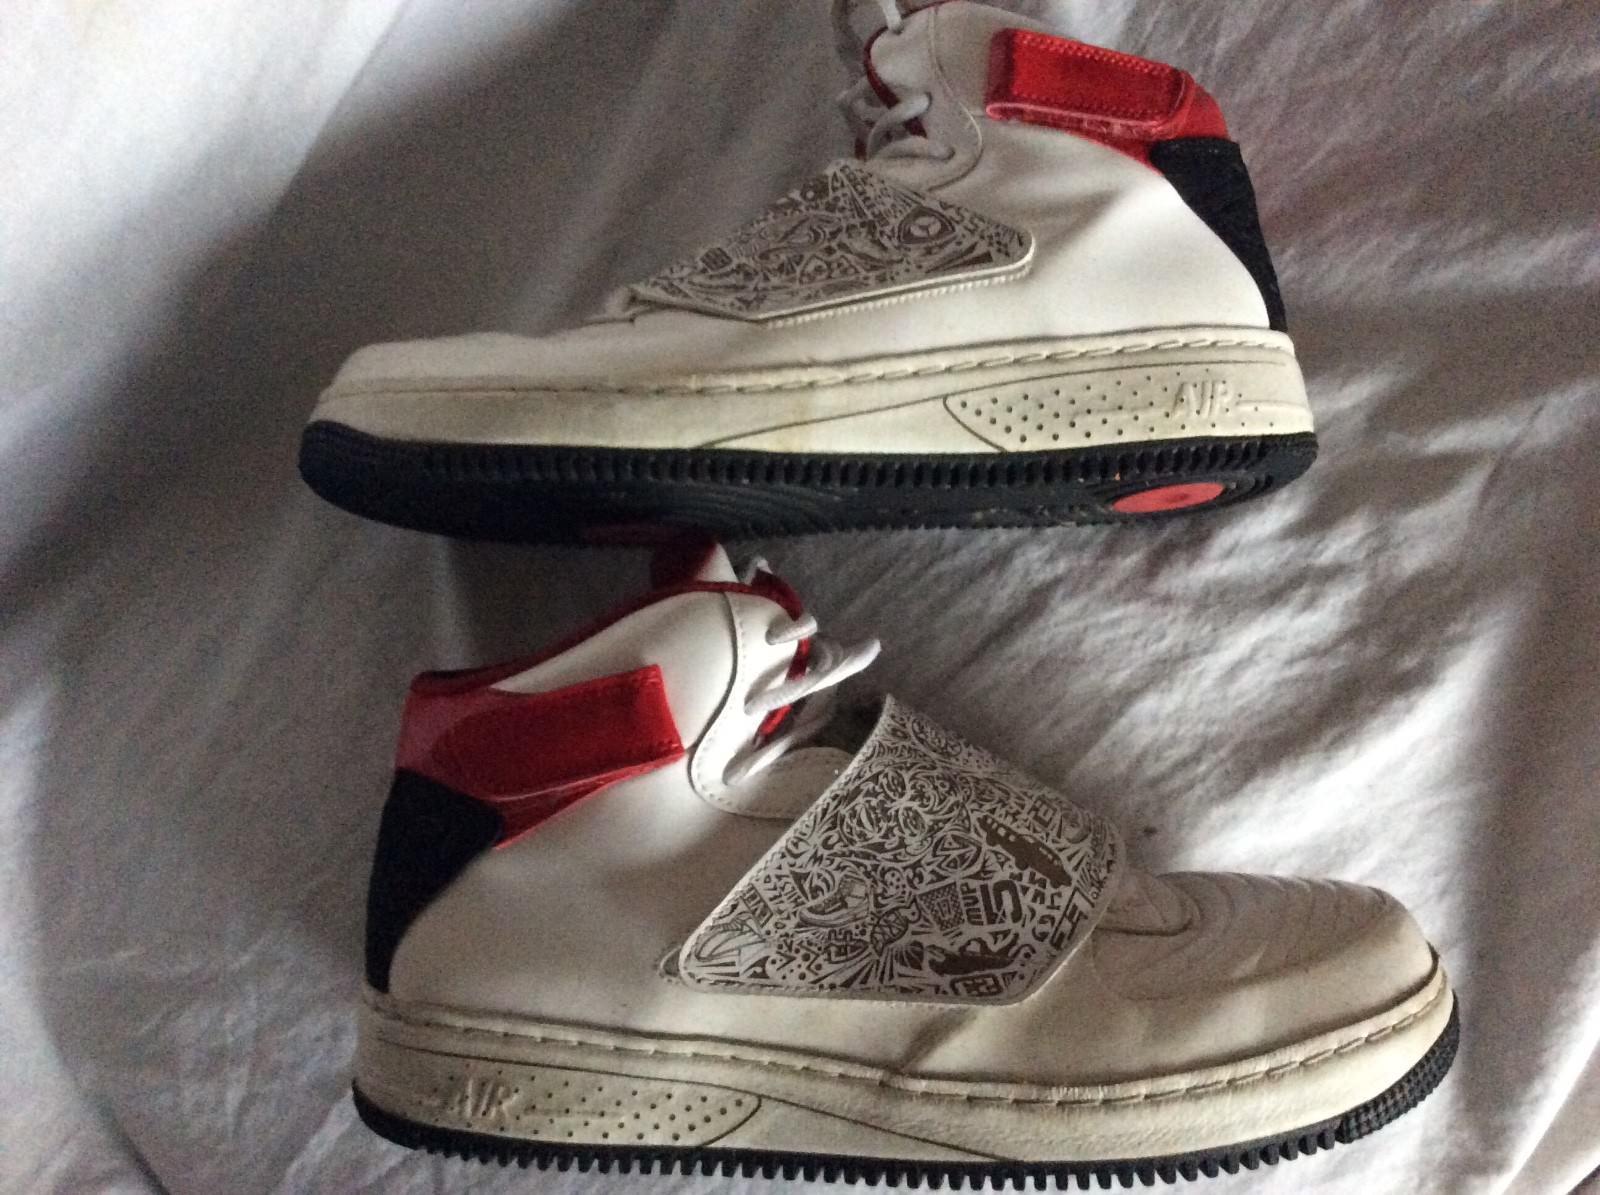 38126fe8a927 ... Nike Air Jordan Fusion AJF 20 White Red Black Shoes Sneakers 331823 101  U.S 13 ...